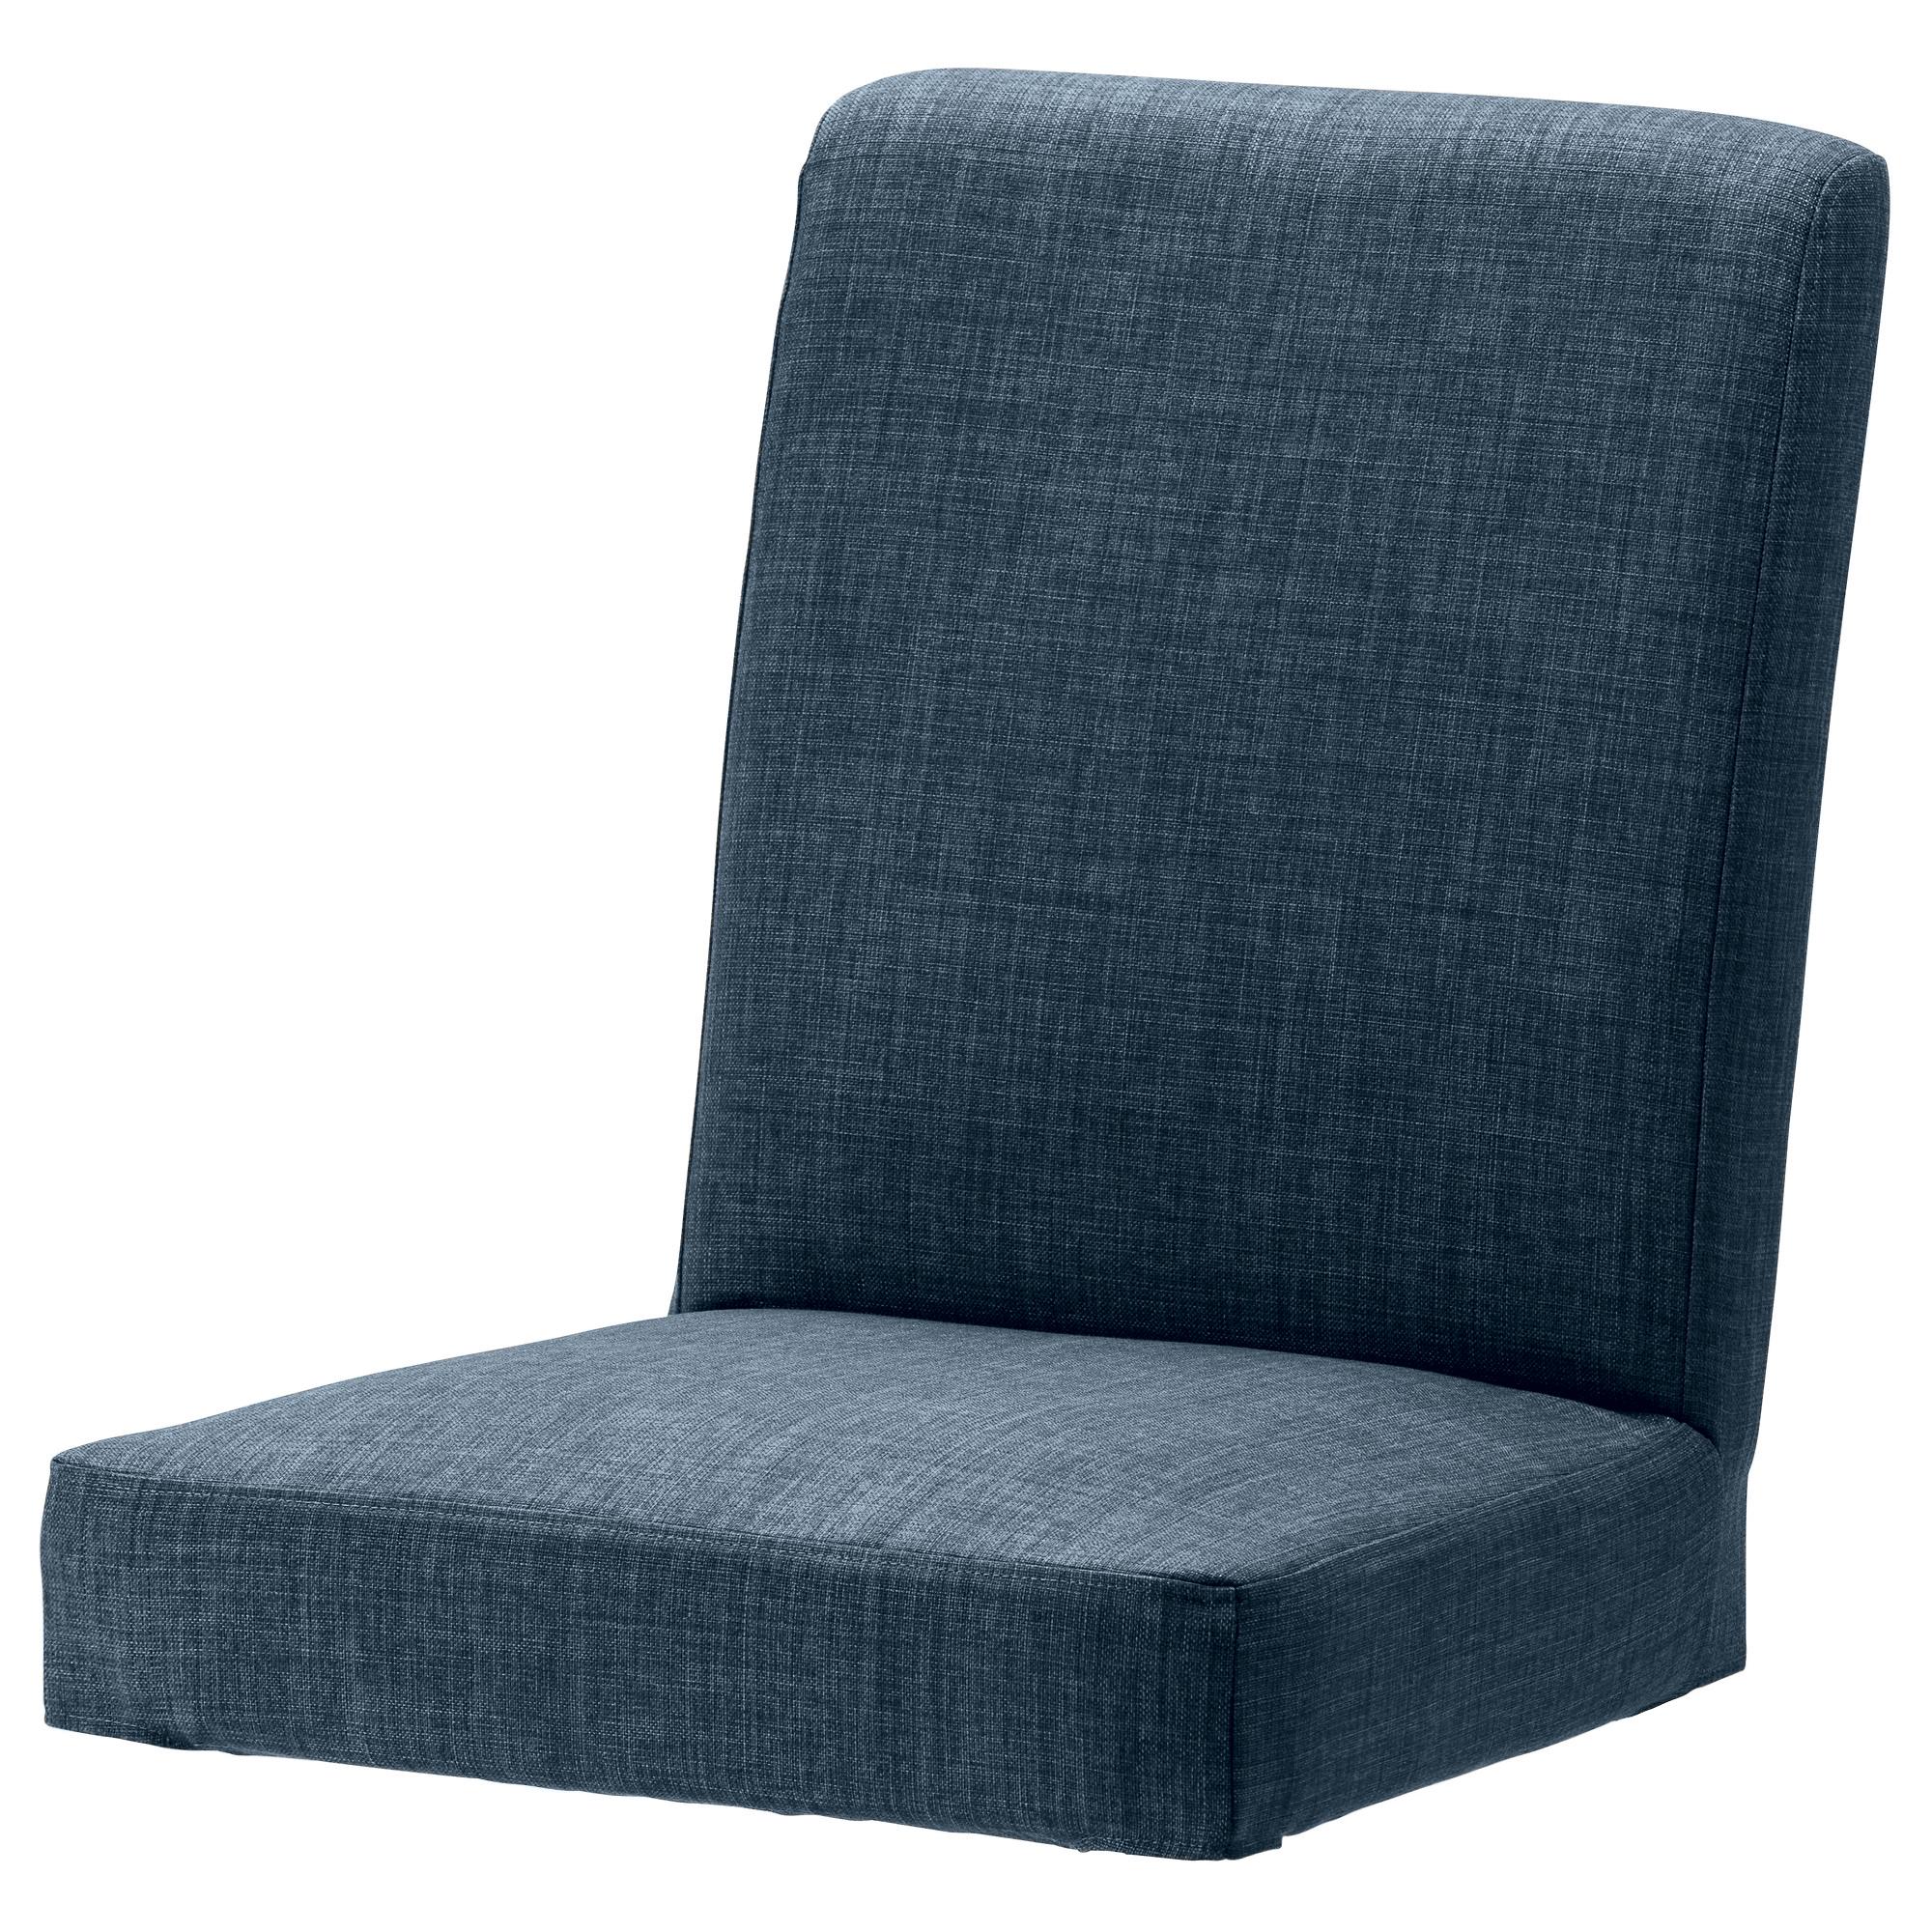 Astounding Nalai And Co Chair Covers Beatyapartments Chair Design Images Beatyapartmentscom